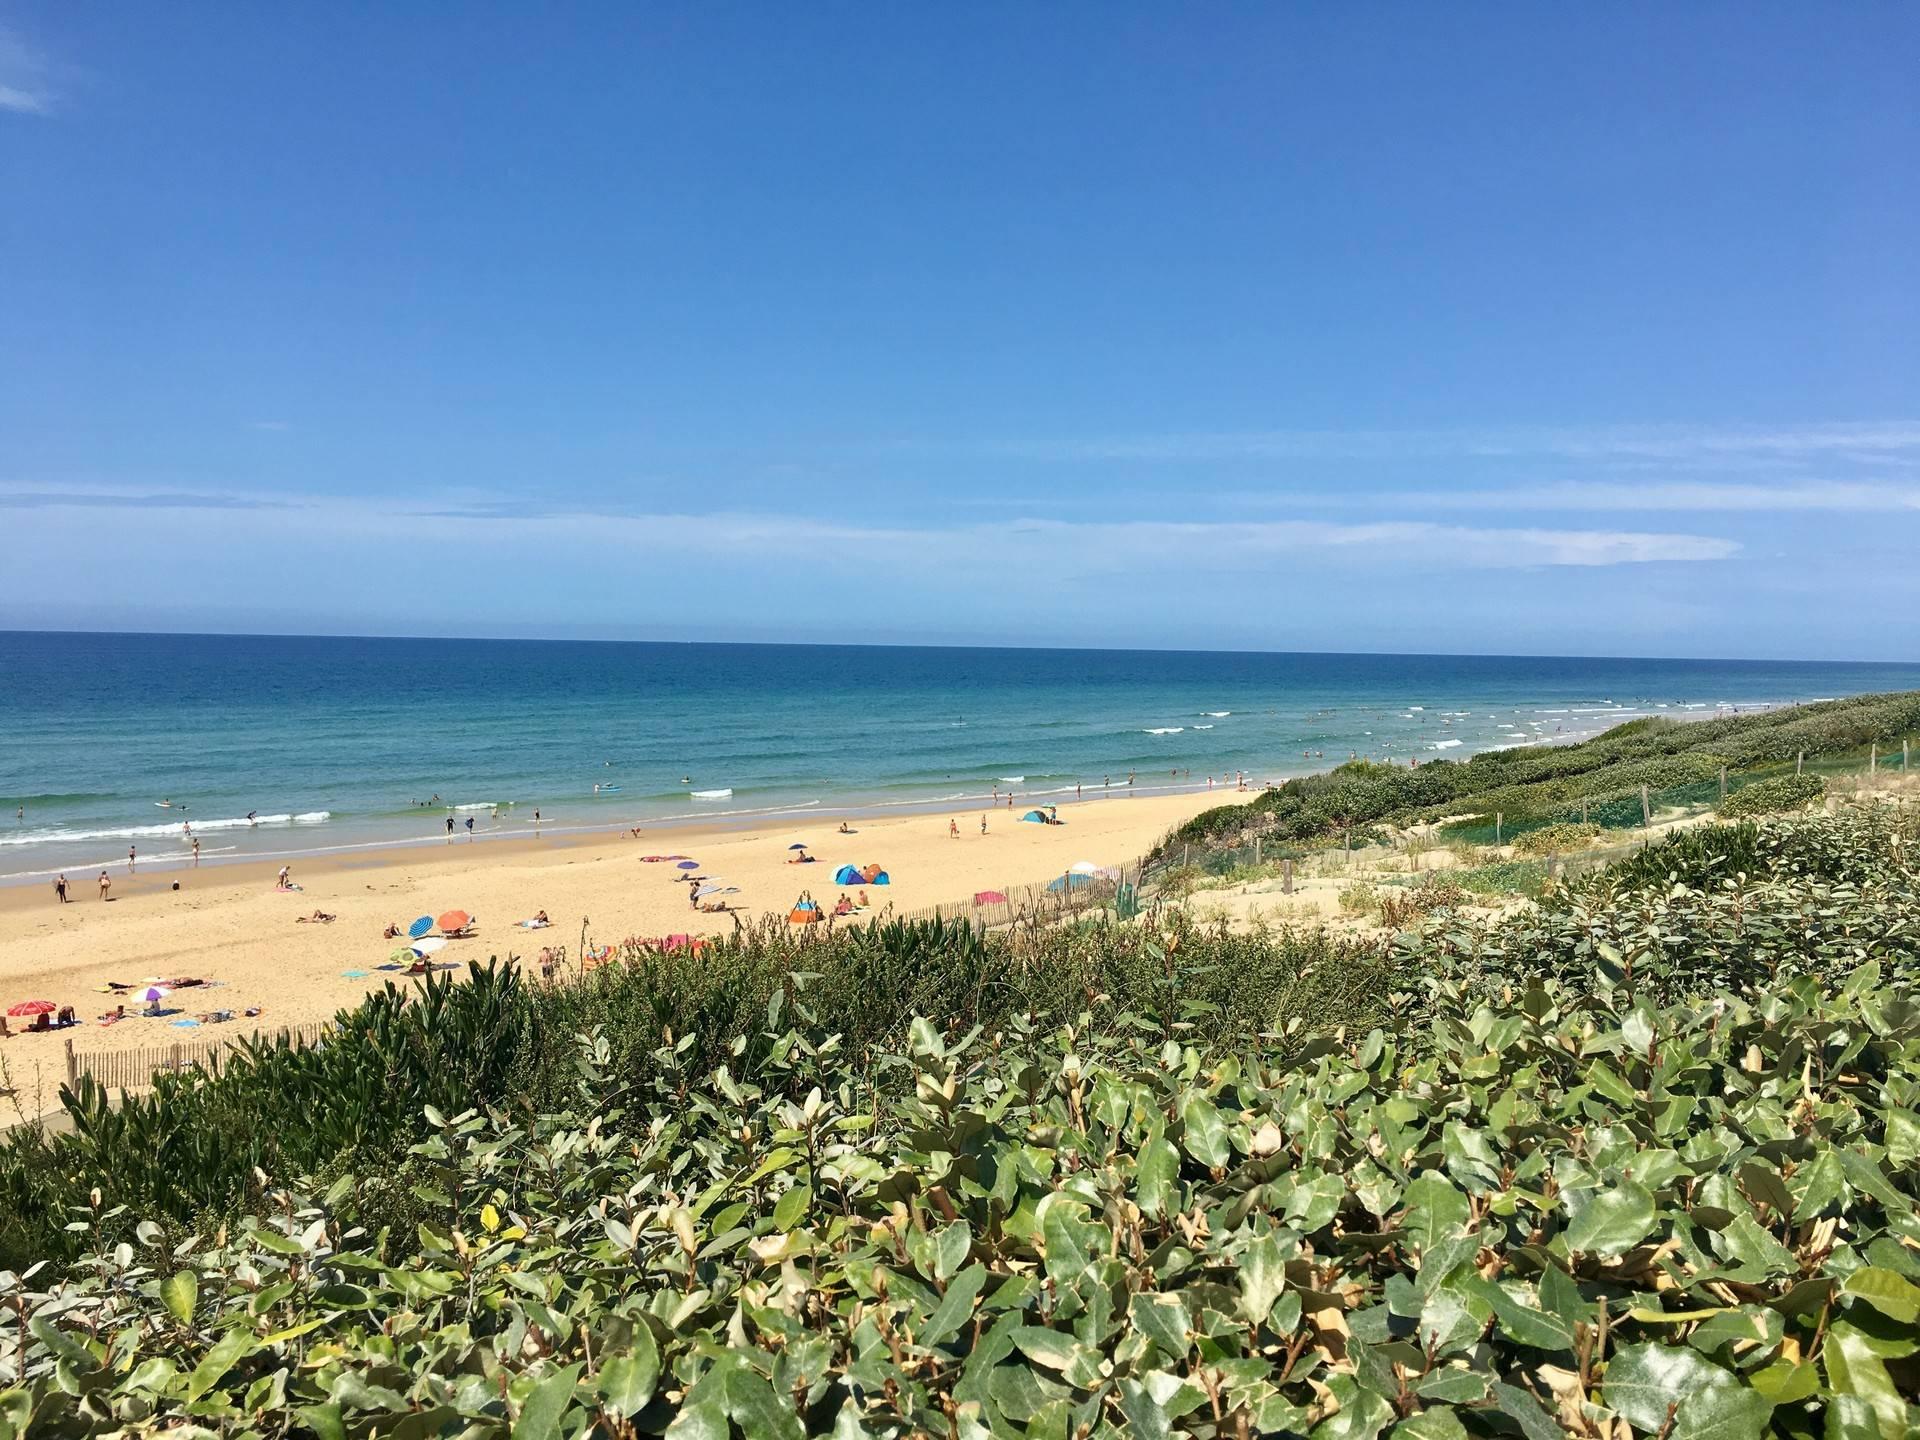 Photo 1: La plage de Bisca